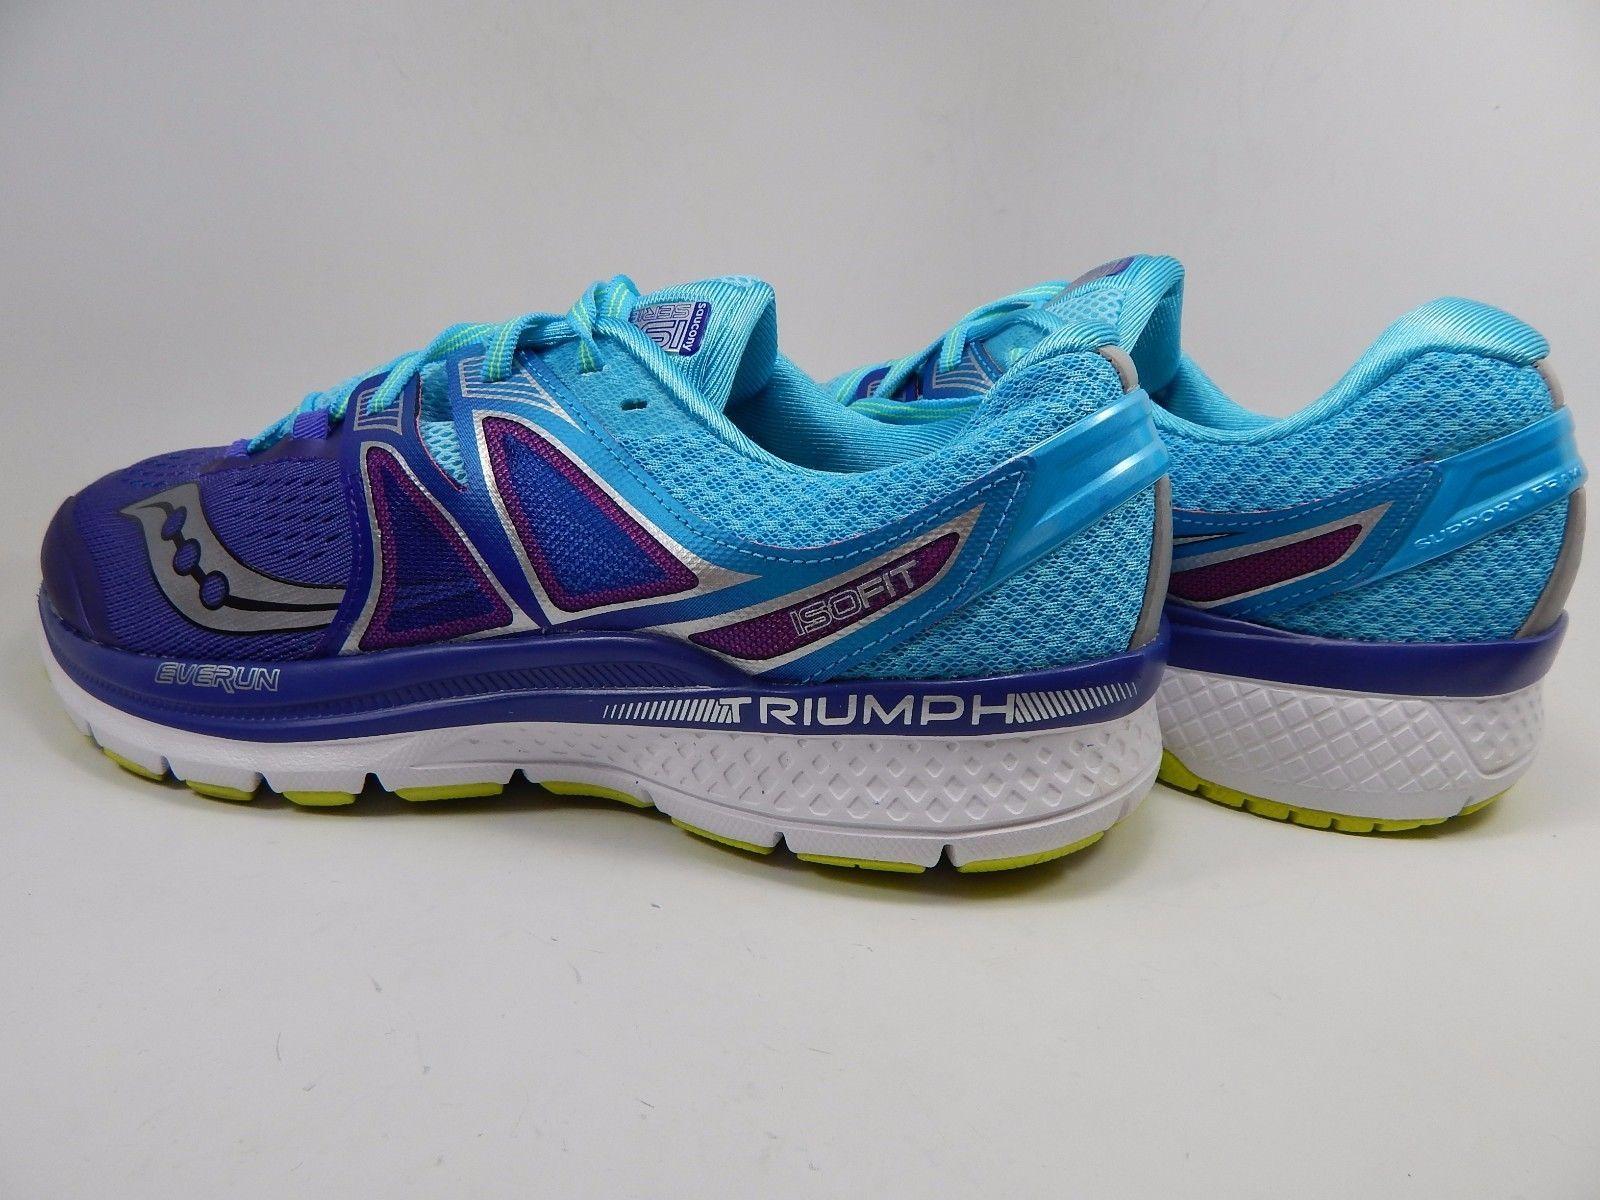 Saucony Triumph ISO 3 Women's Running Shoes Size: US 11 M (B) EU 43 S10346-1